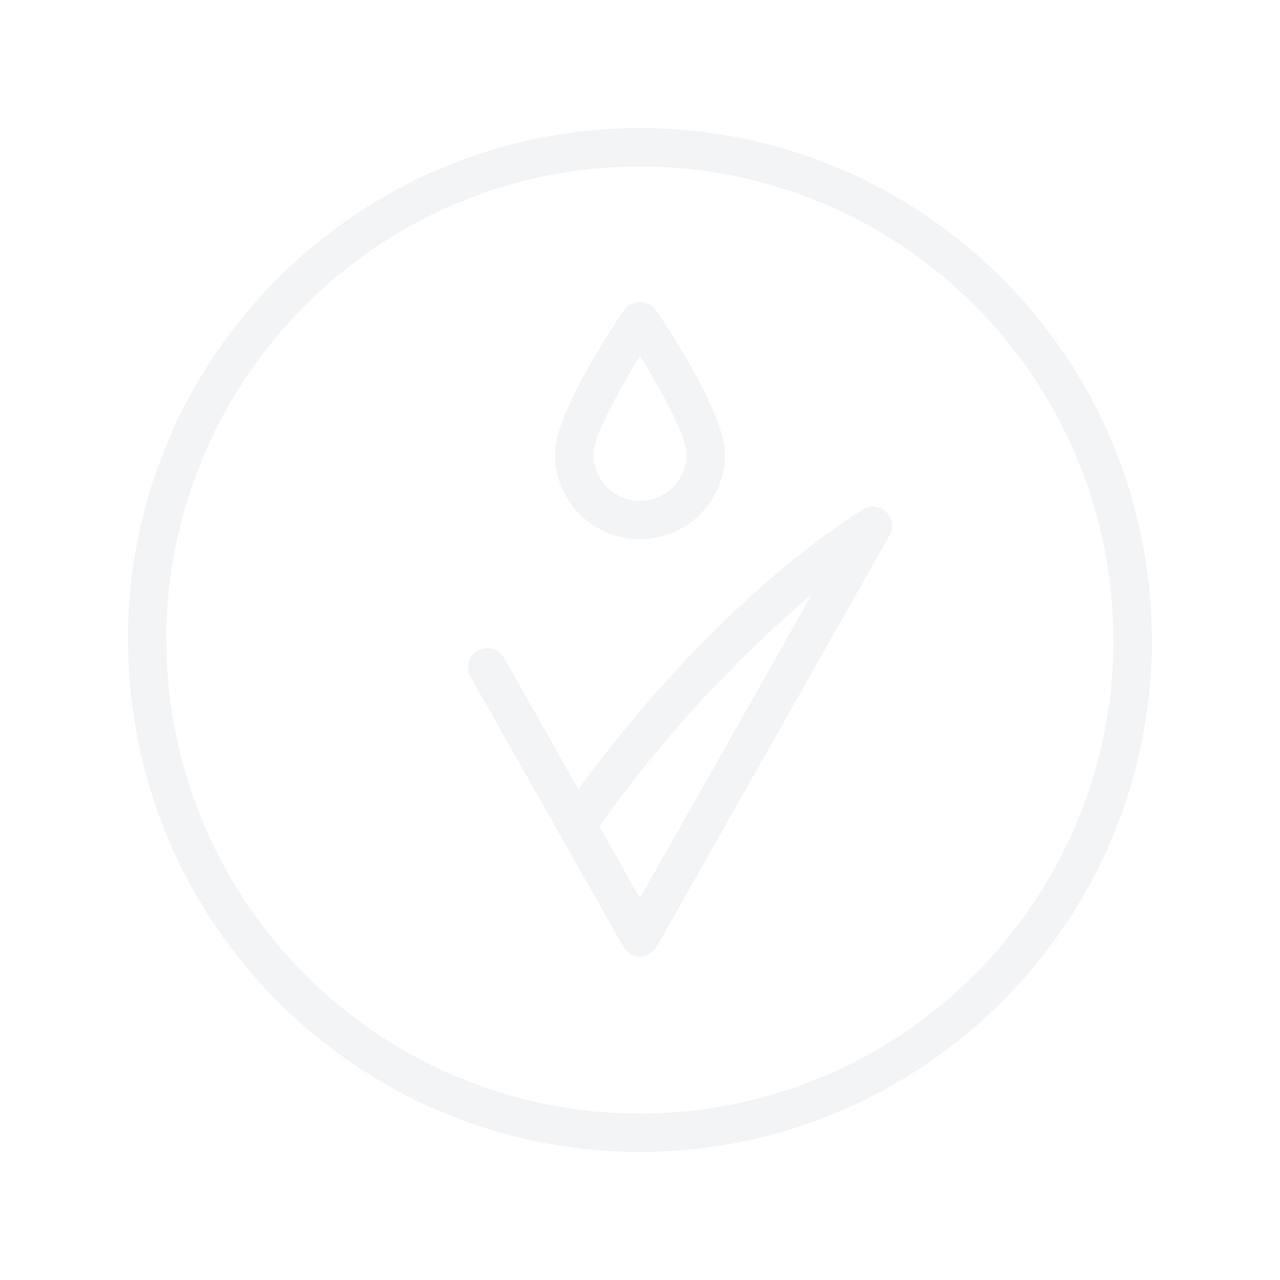 DR. BRONNERS Peppermint Pure Castile Soap